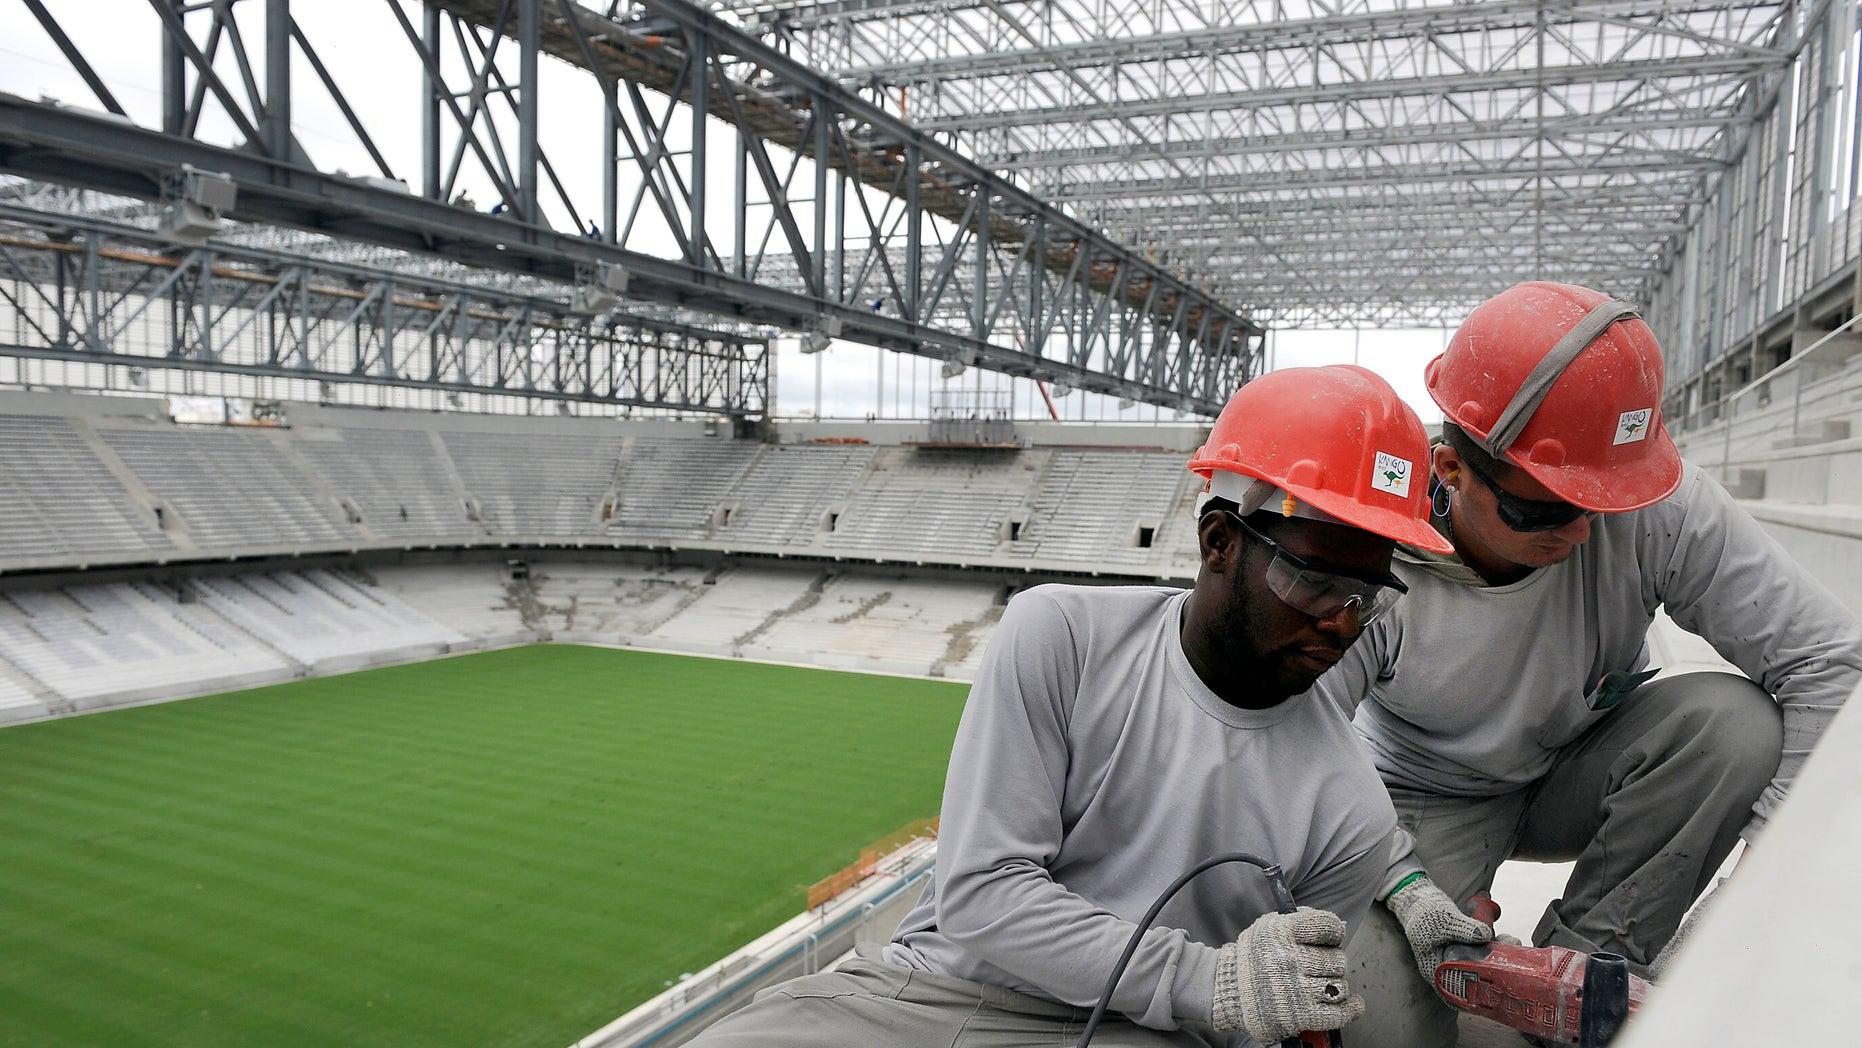 Personnel work on the construction of Arena da Baixada in Curitiba, Brazil, Tuesday, Feb. 18, 2014.